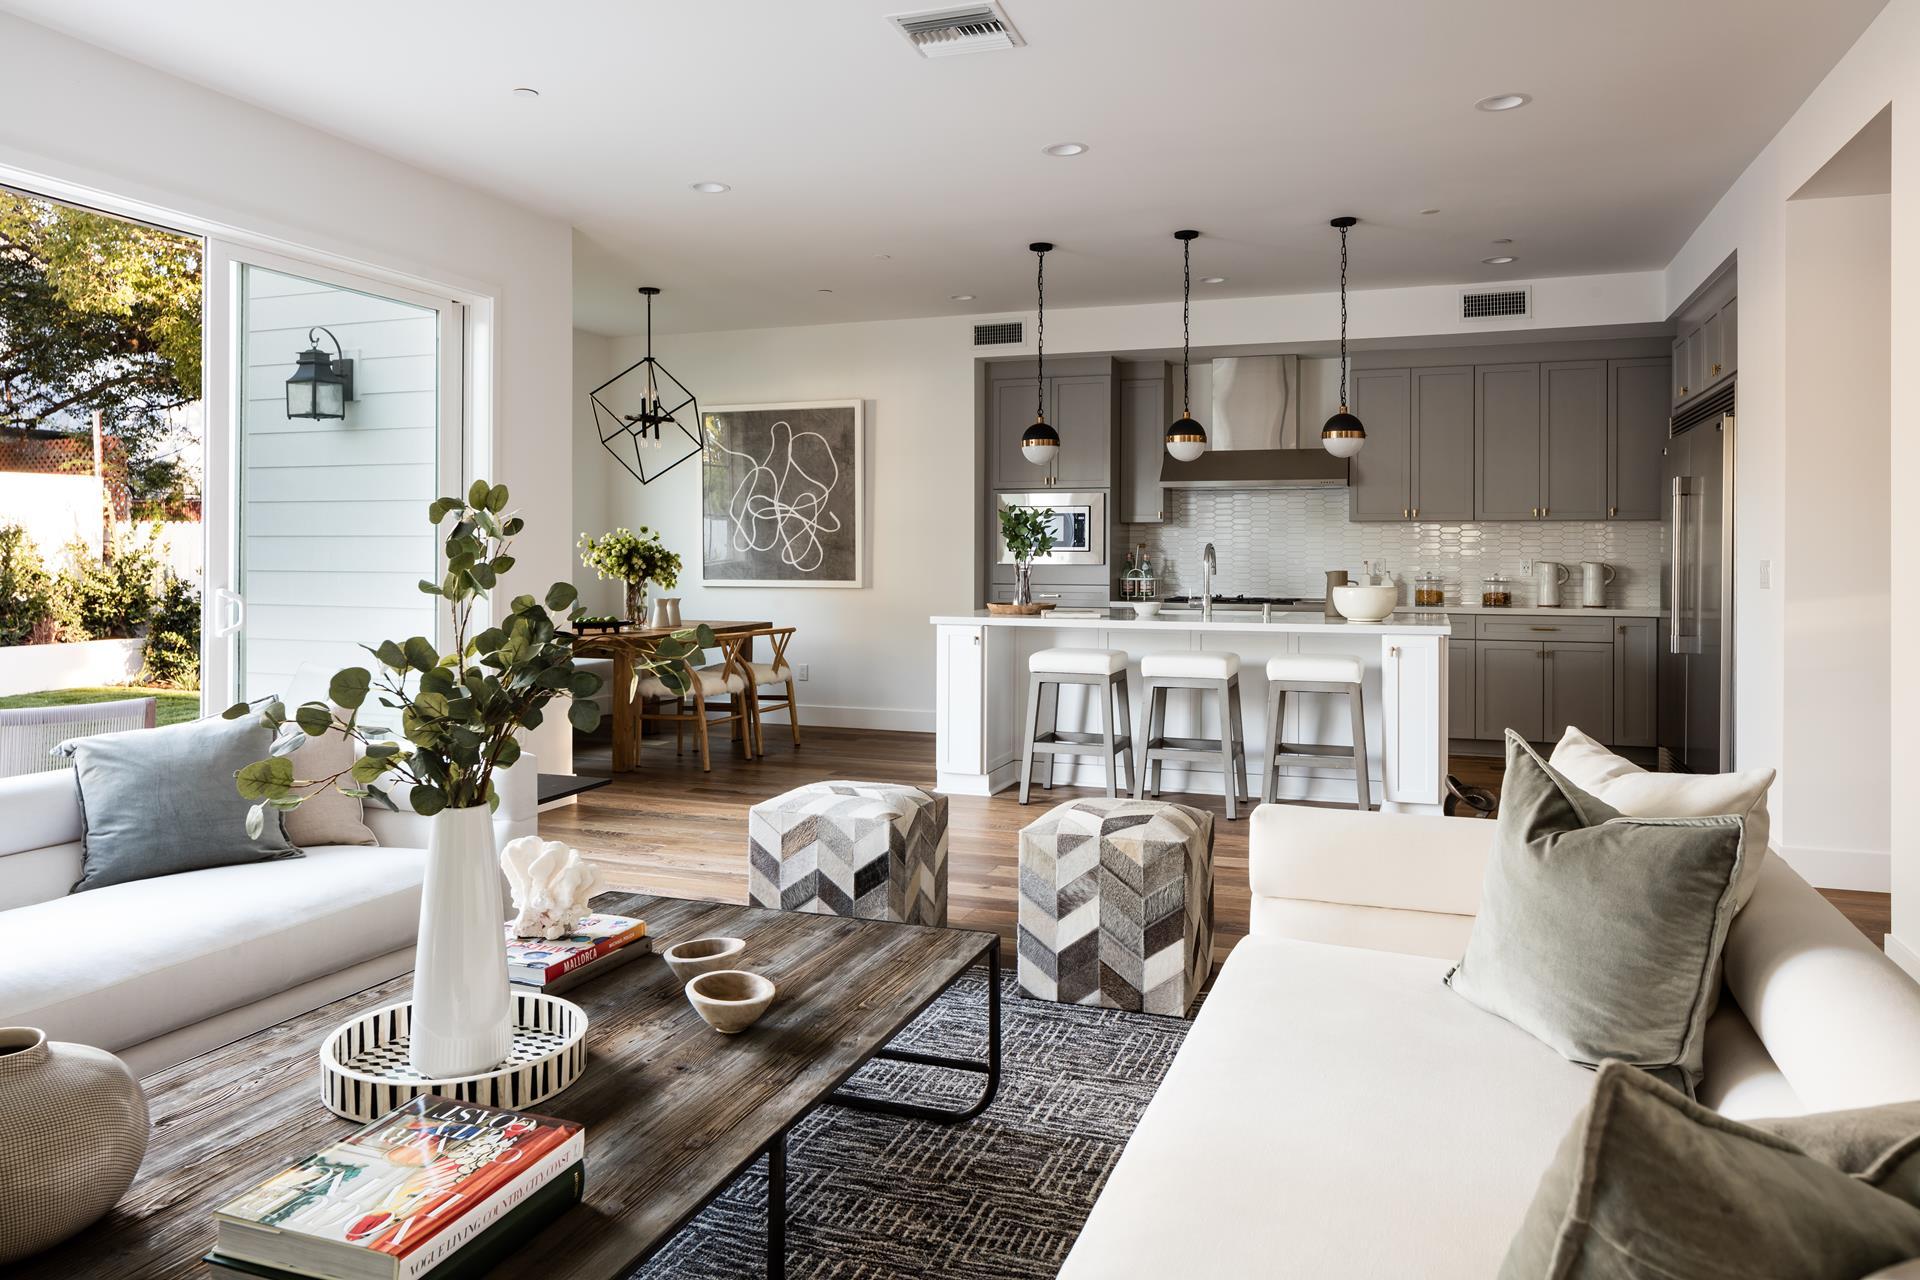 3710 MEIER Street - Palms / Mar Vista, California